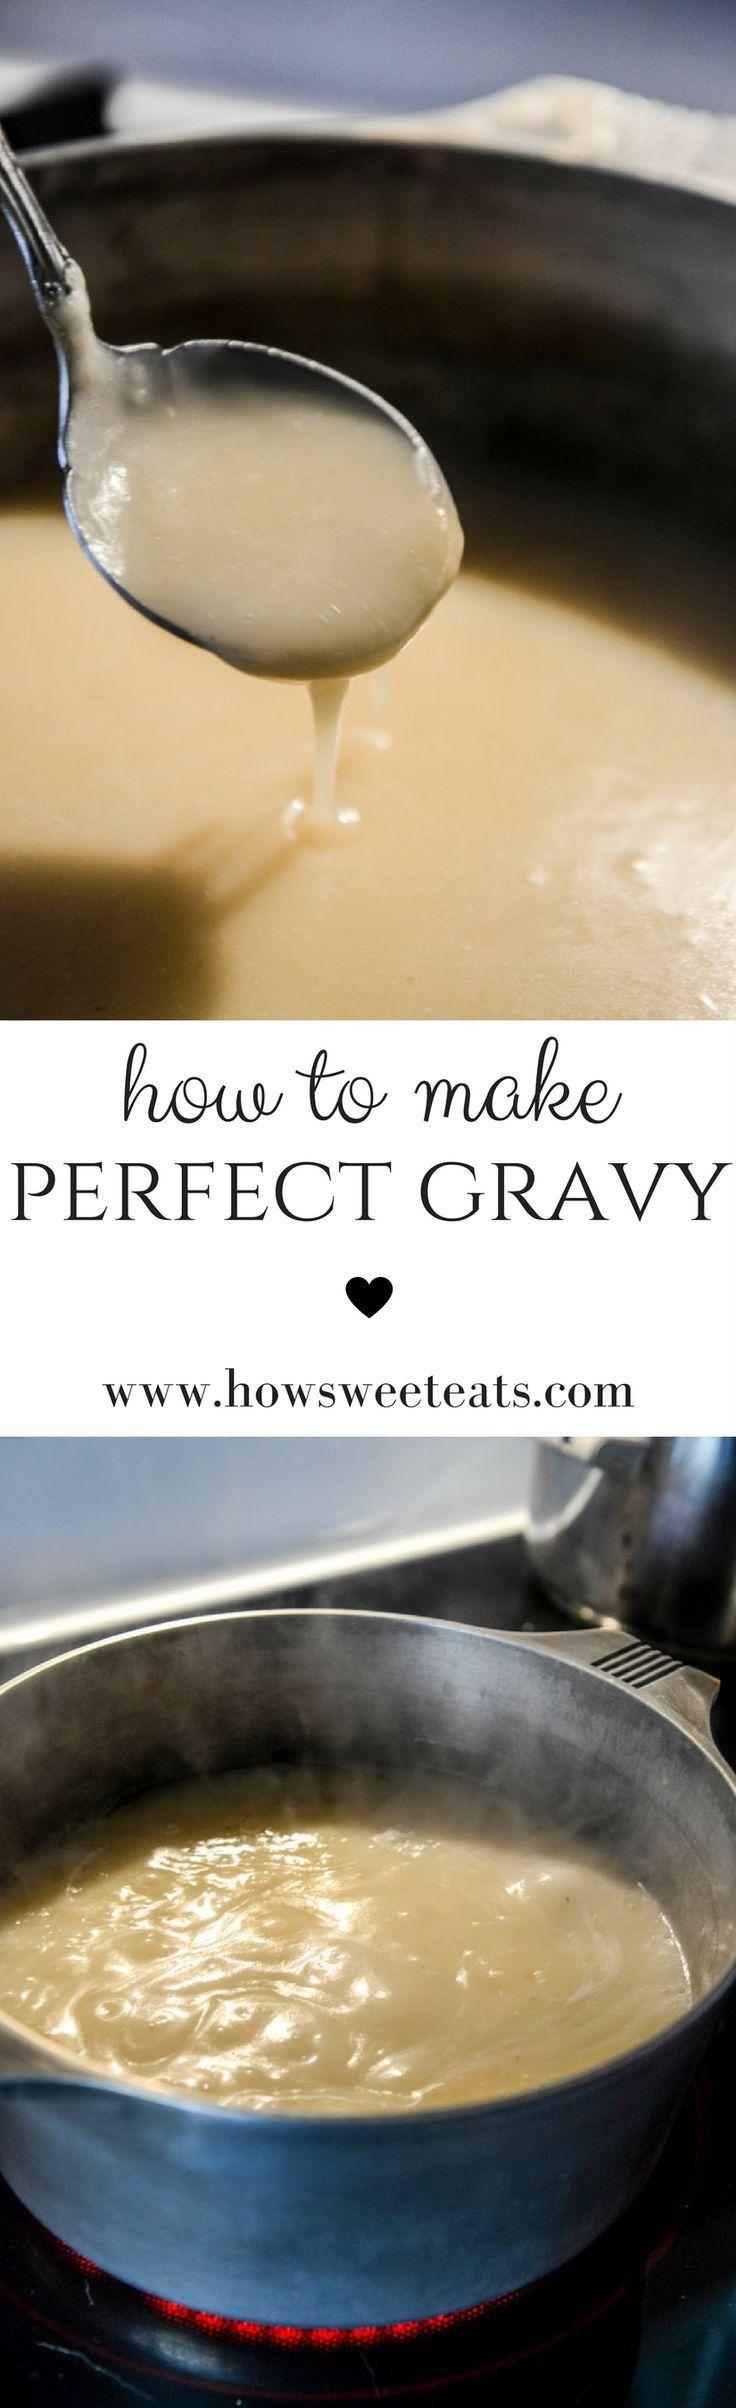 How to Make the BEST Gravy for Thanksgiving! I http://howsweeteats.com /howsweeteats/ #thanksgiving